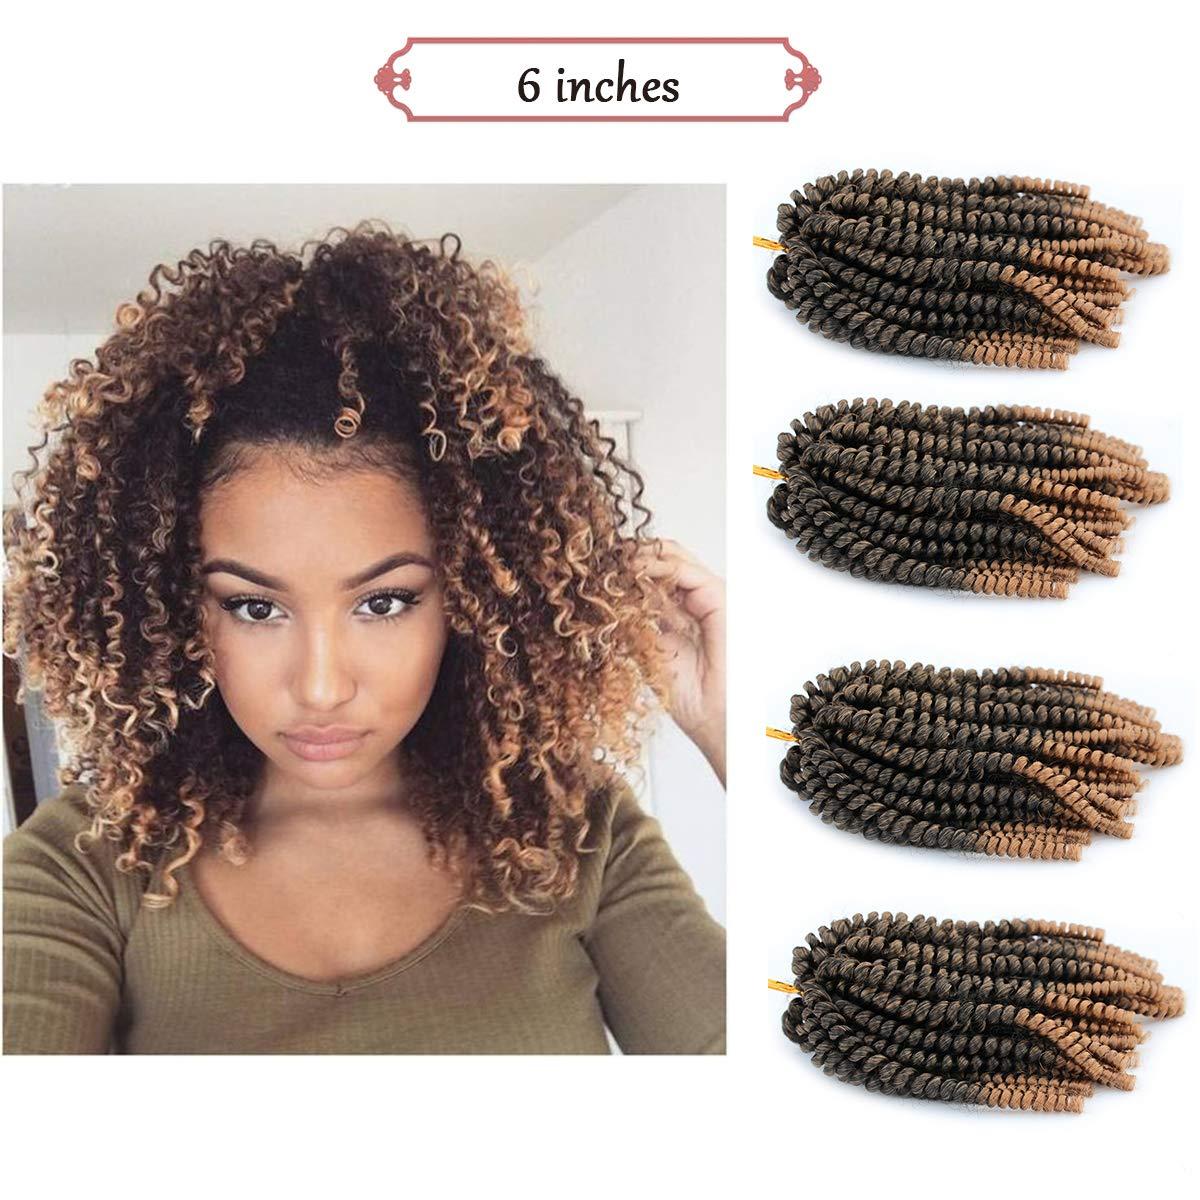 Amazoncom 4pcs Spring Twist Crochet Braiding Hair 6 Inch Ombre